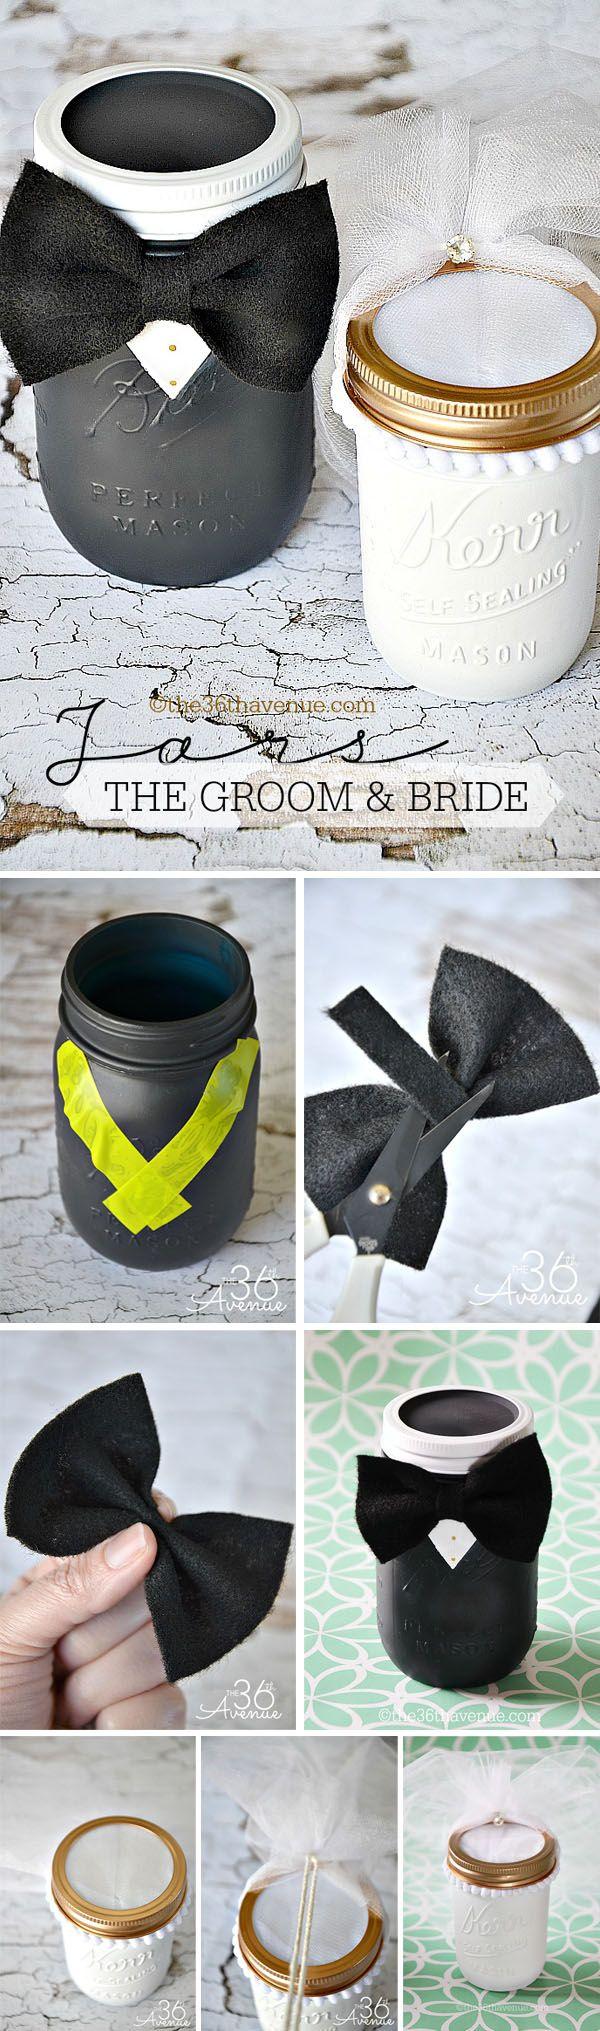 the groom and bride wedding mason jar gifts